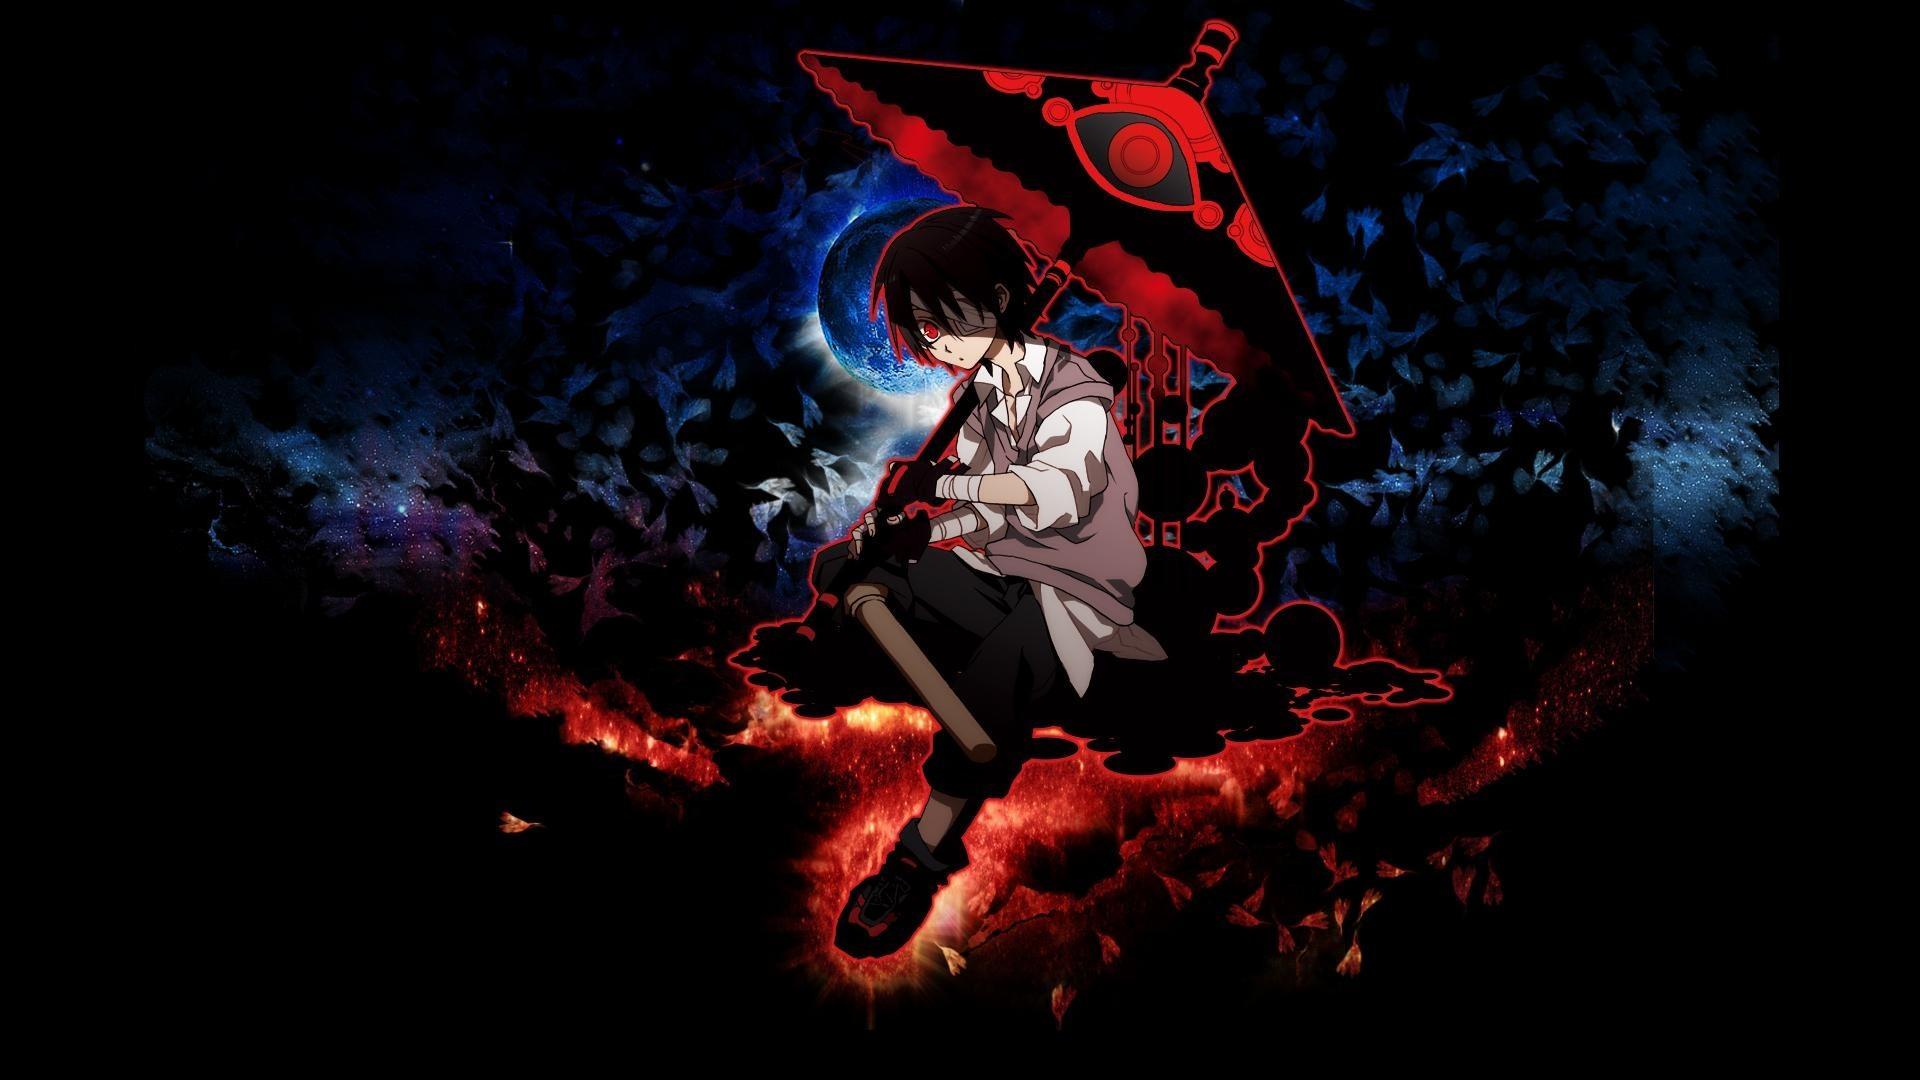 Epic Dark Anime Wallpaper 60 Pictures